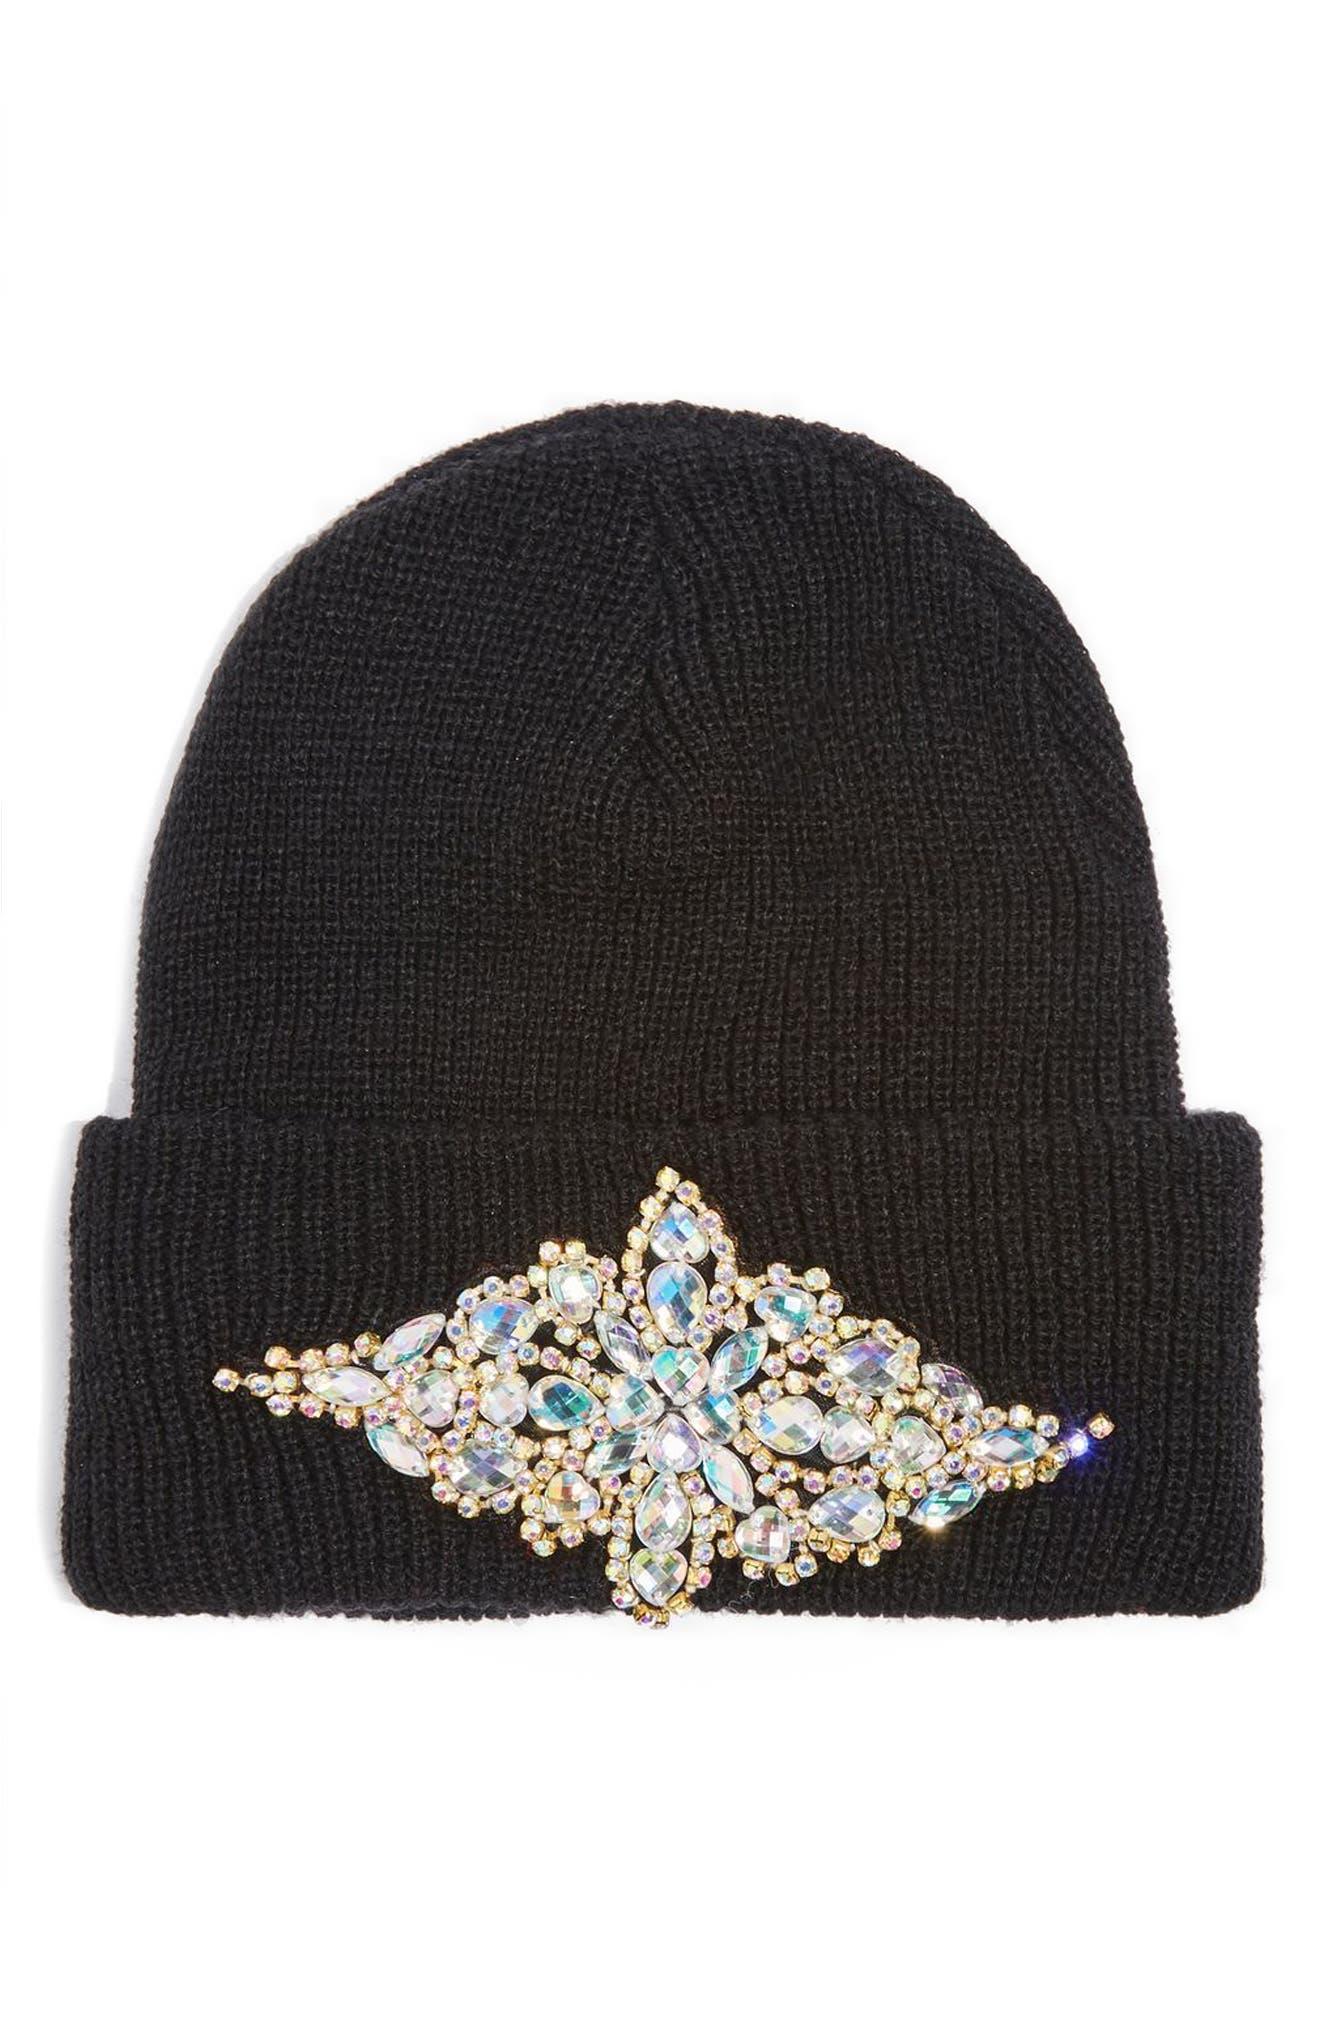 Topshop Bling Beanie Hat